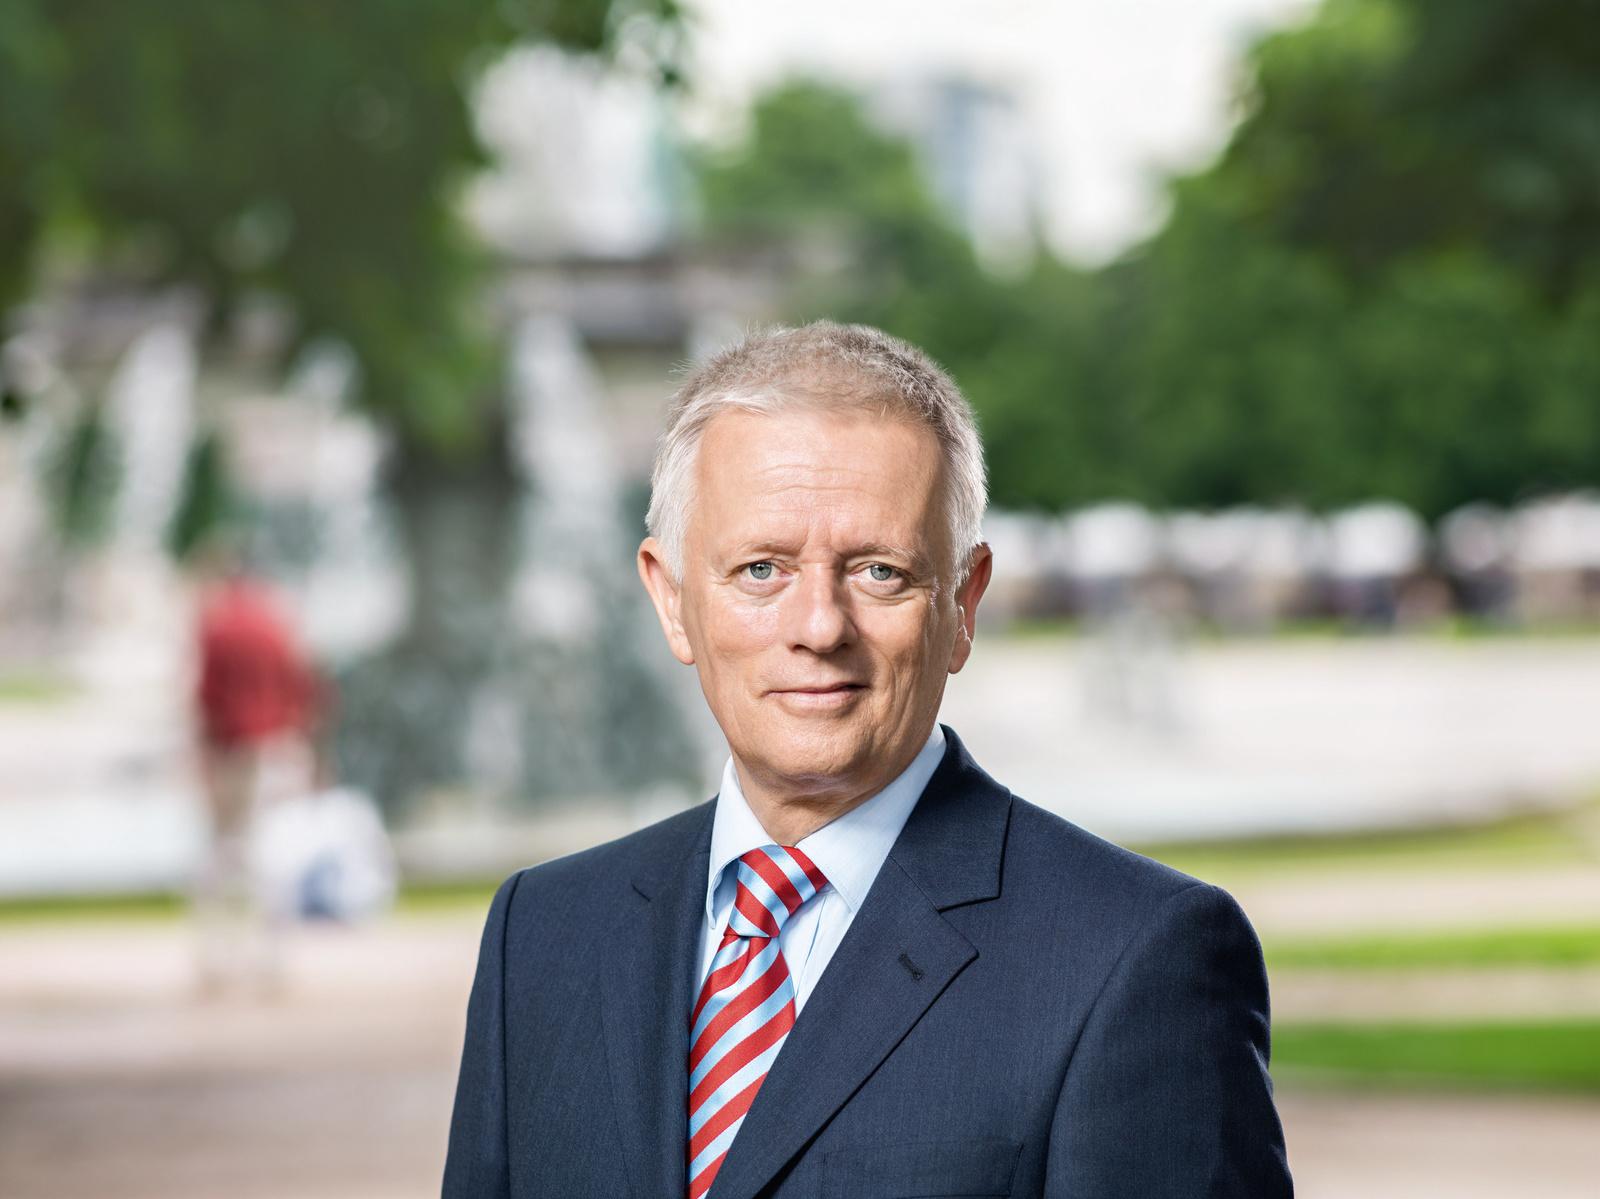 Fritz Kuhn, Oberbürgermeister der Landeshauptstadt Stuttgart